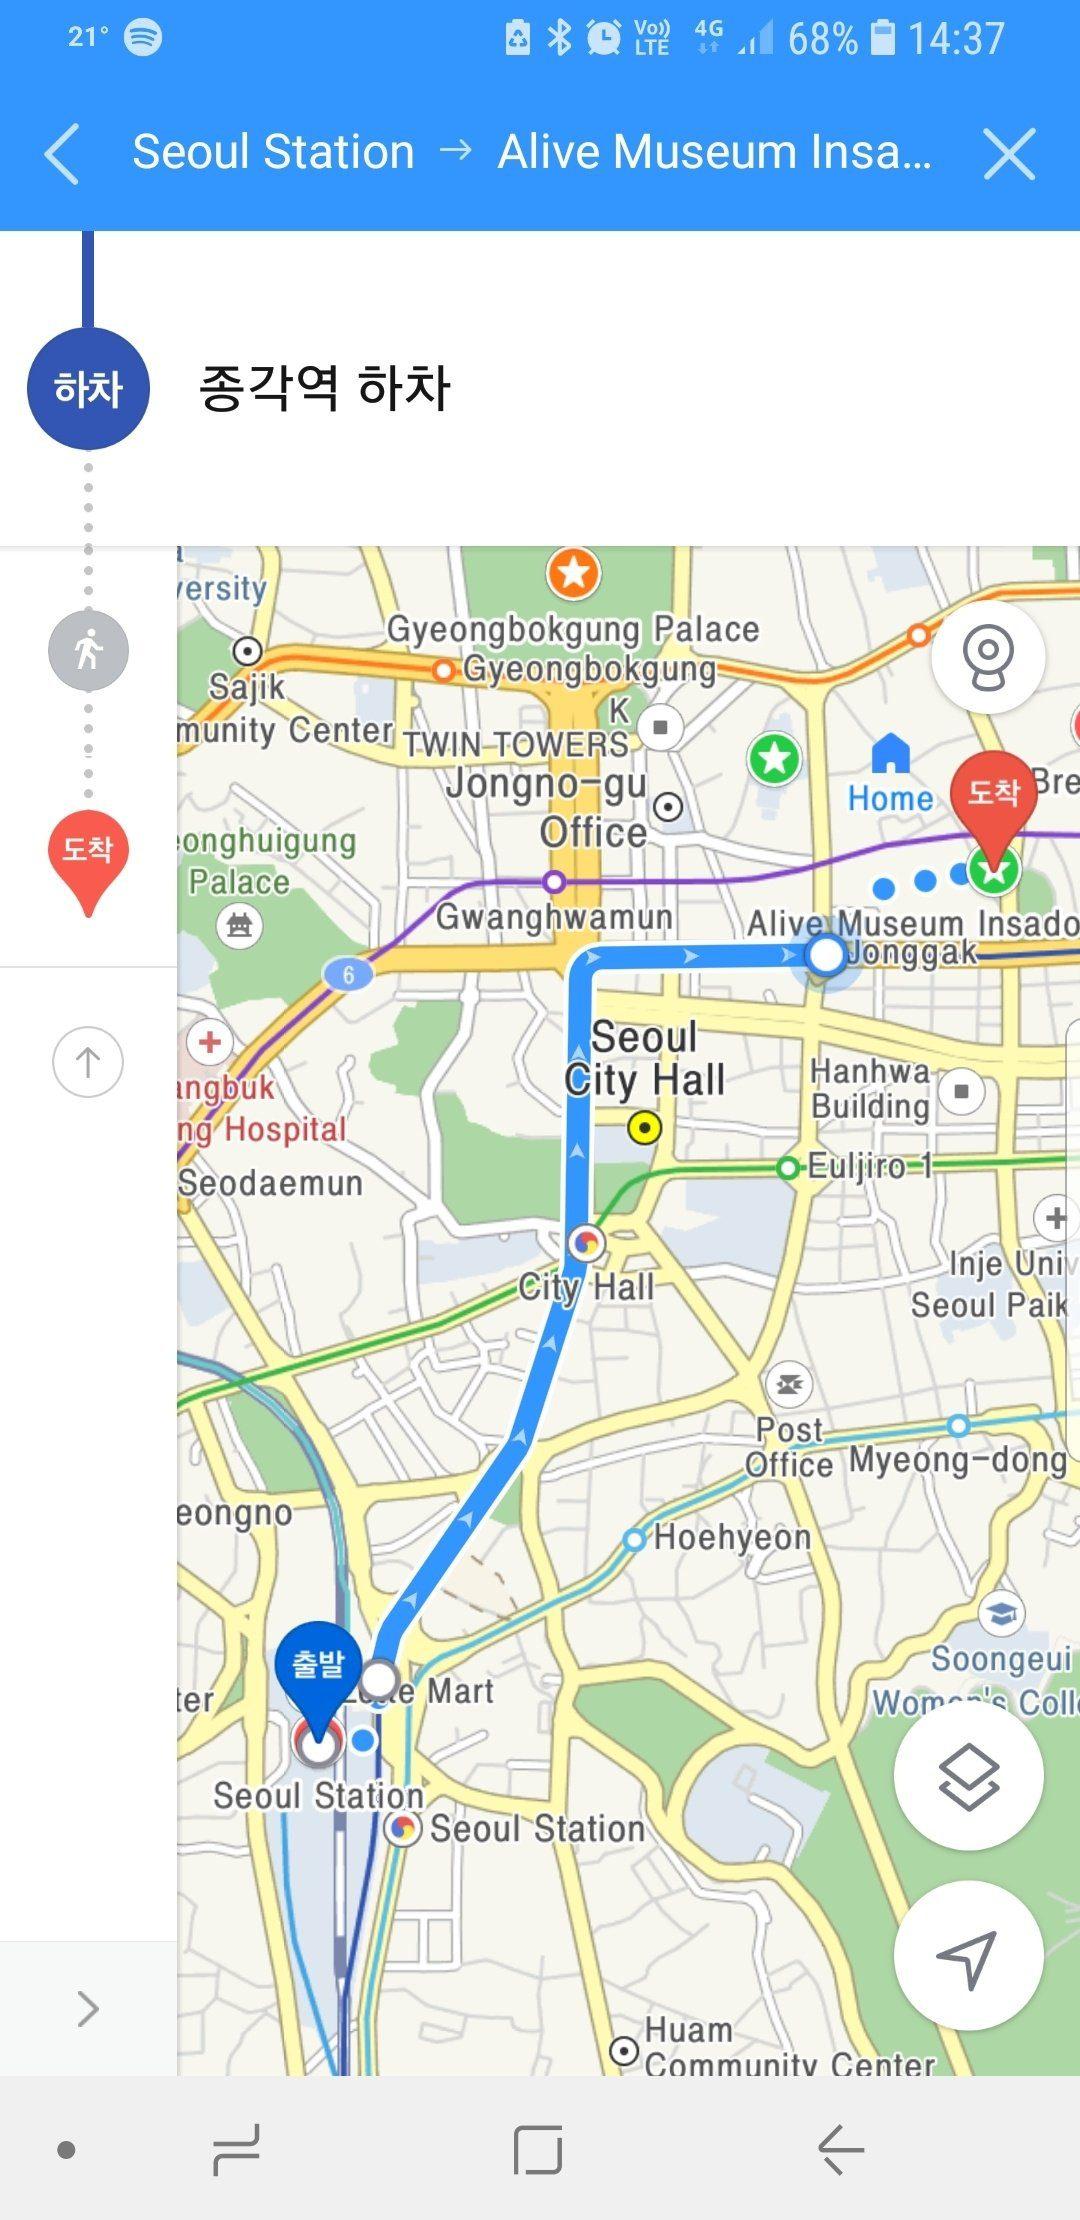 South Korea Trip Apps - KakaoMap